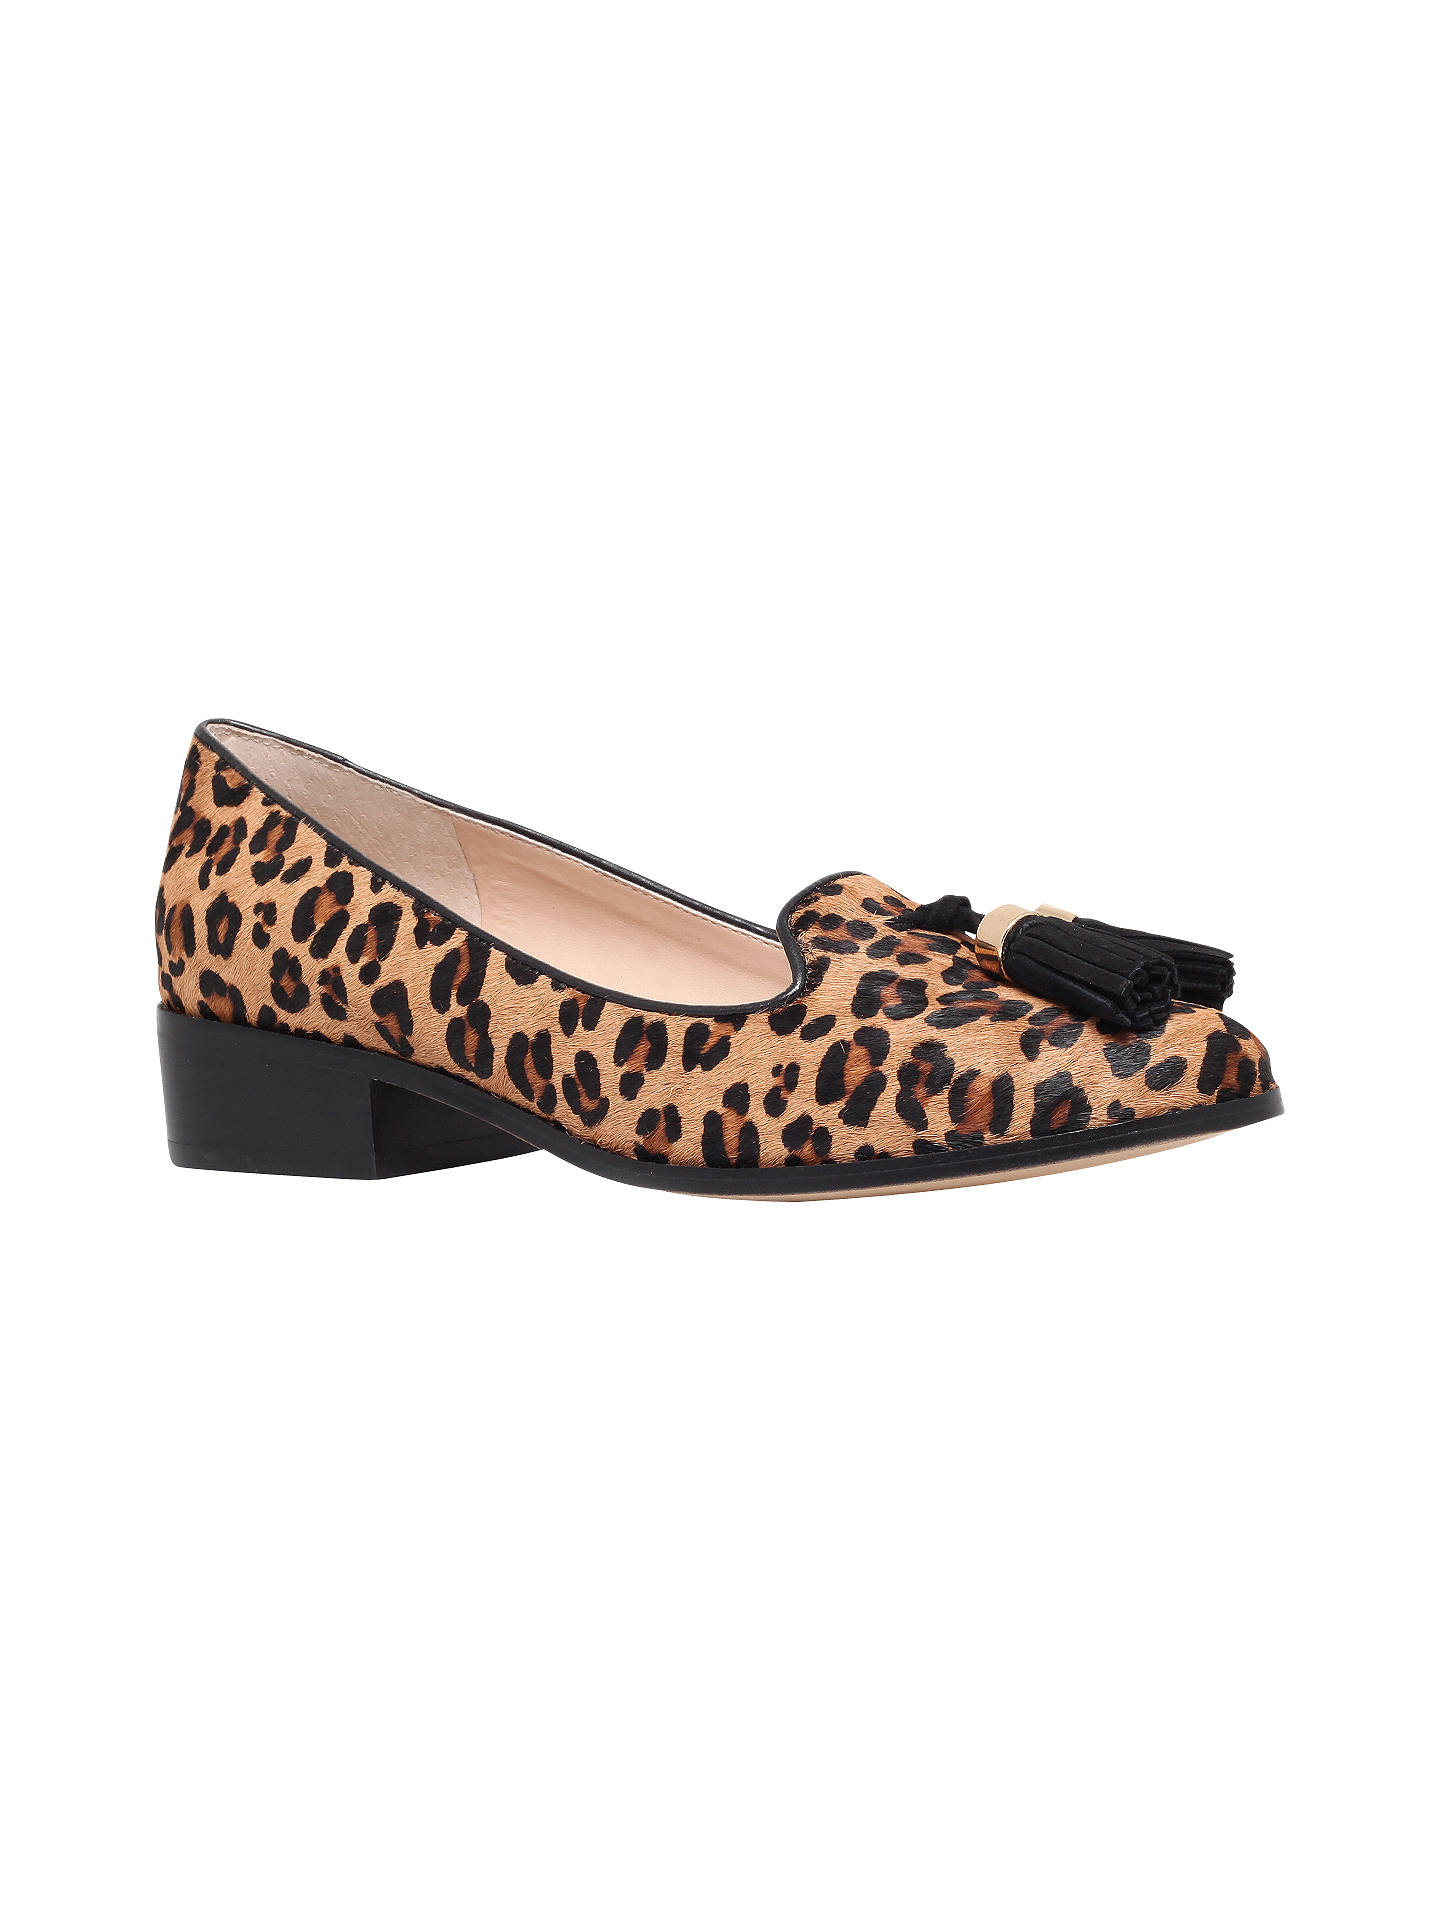 1e5a57008c7 Buy Carvela Laura Pony Tassel Loafers